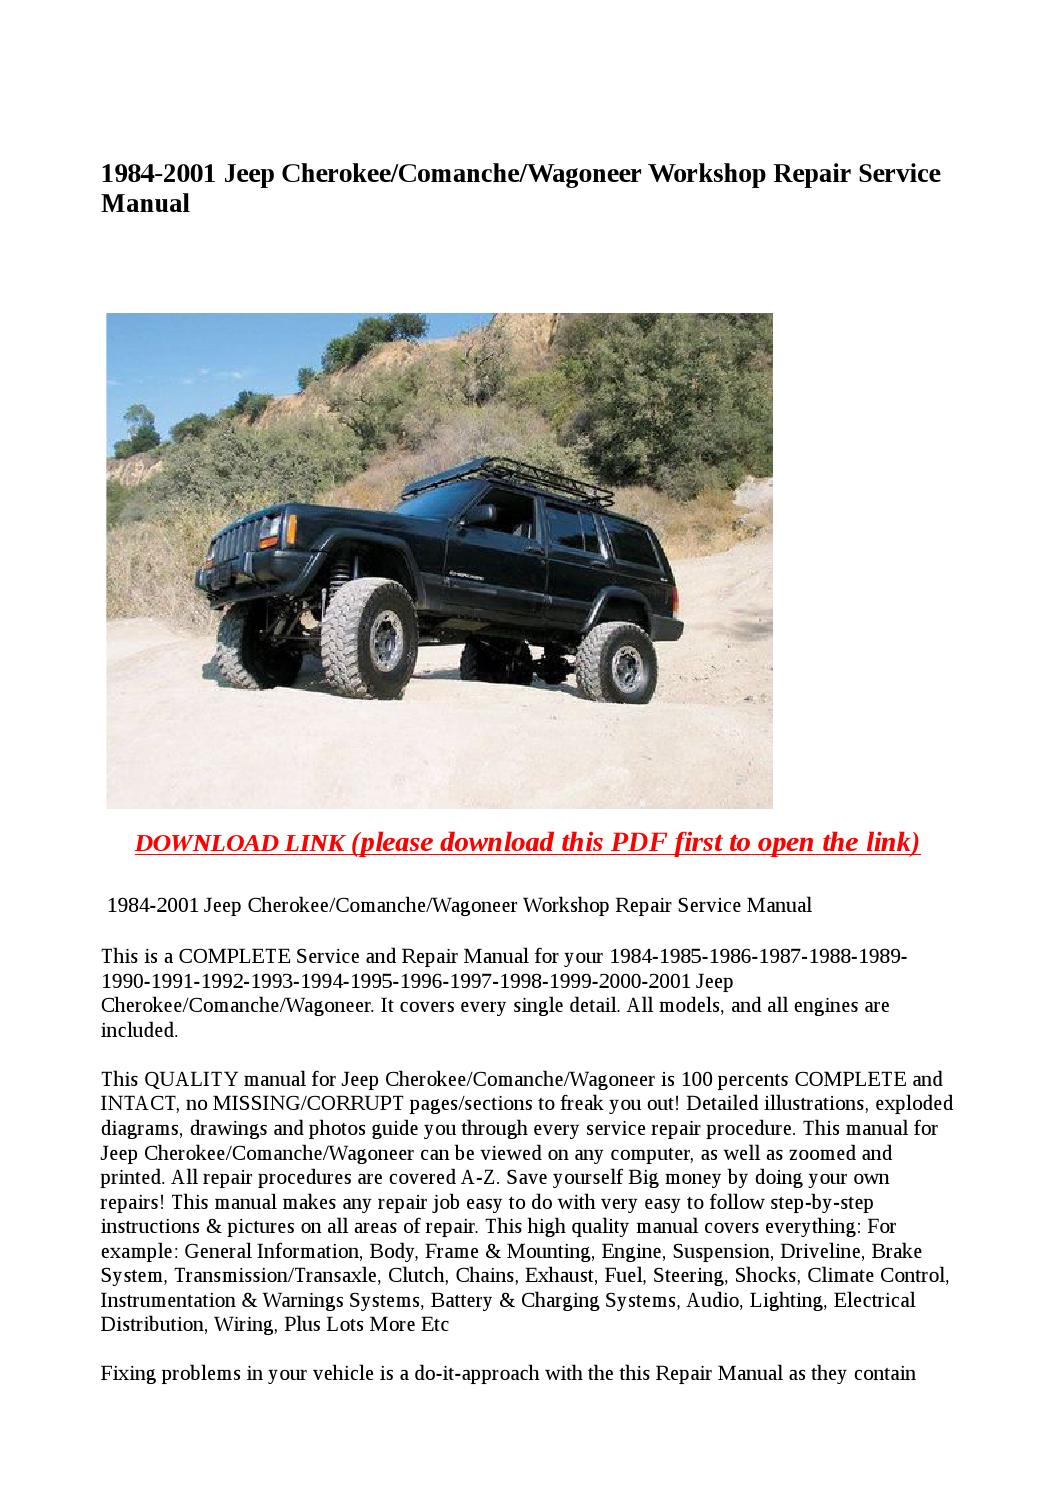 1984 2001 Jeep Cherokee Comanche Wagoneer Workshop Repair Service Manual By Abcdeefr